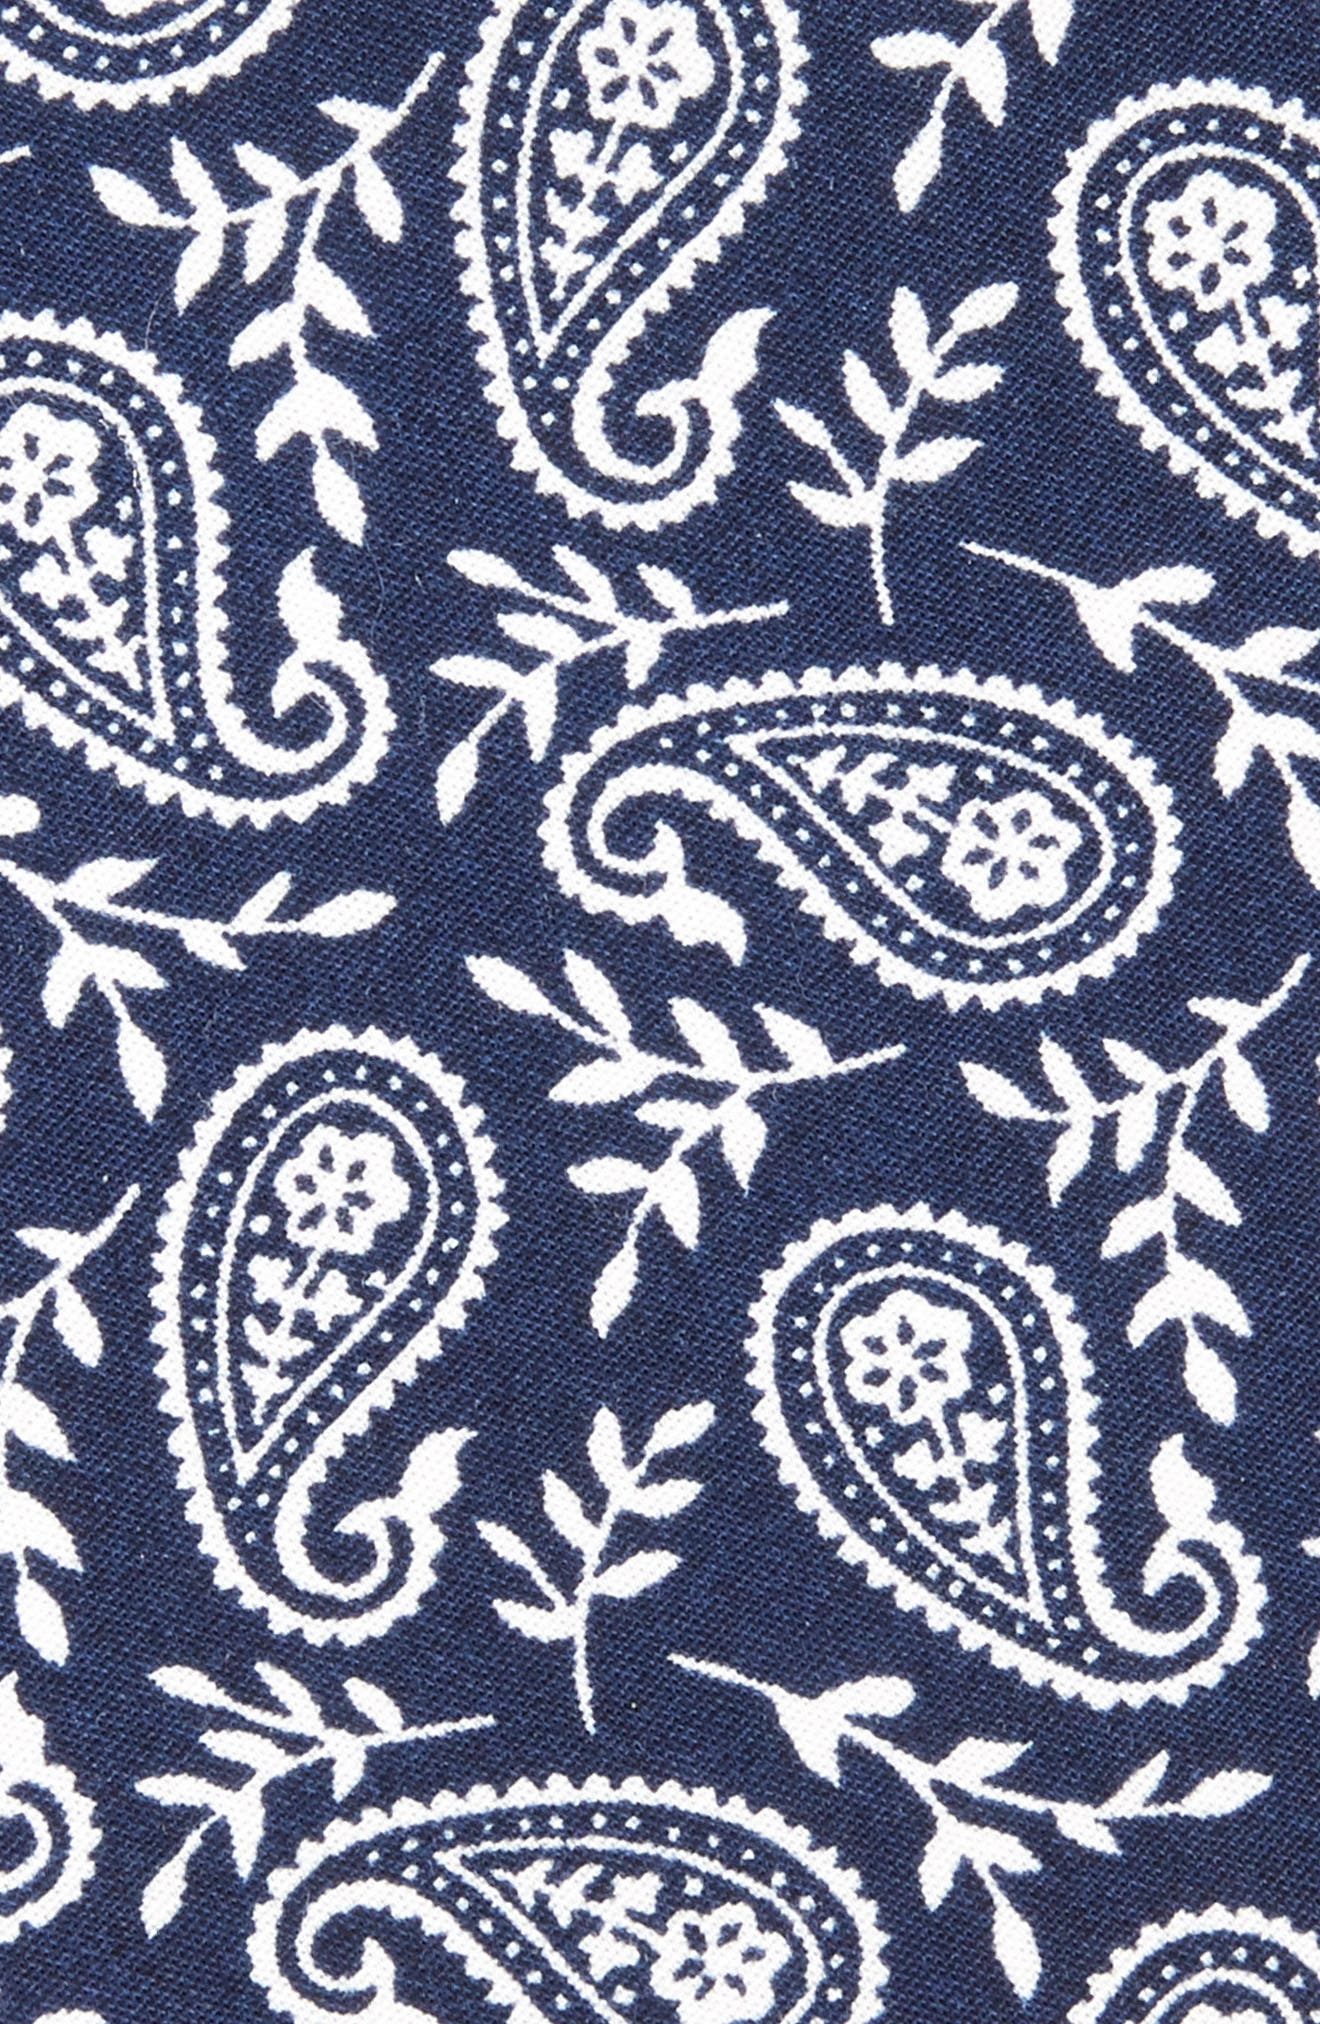 Paisley Cotton Skinny Tie,                             Alternate thumbnail 2, color,                             410